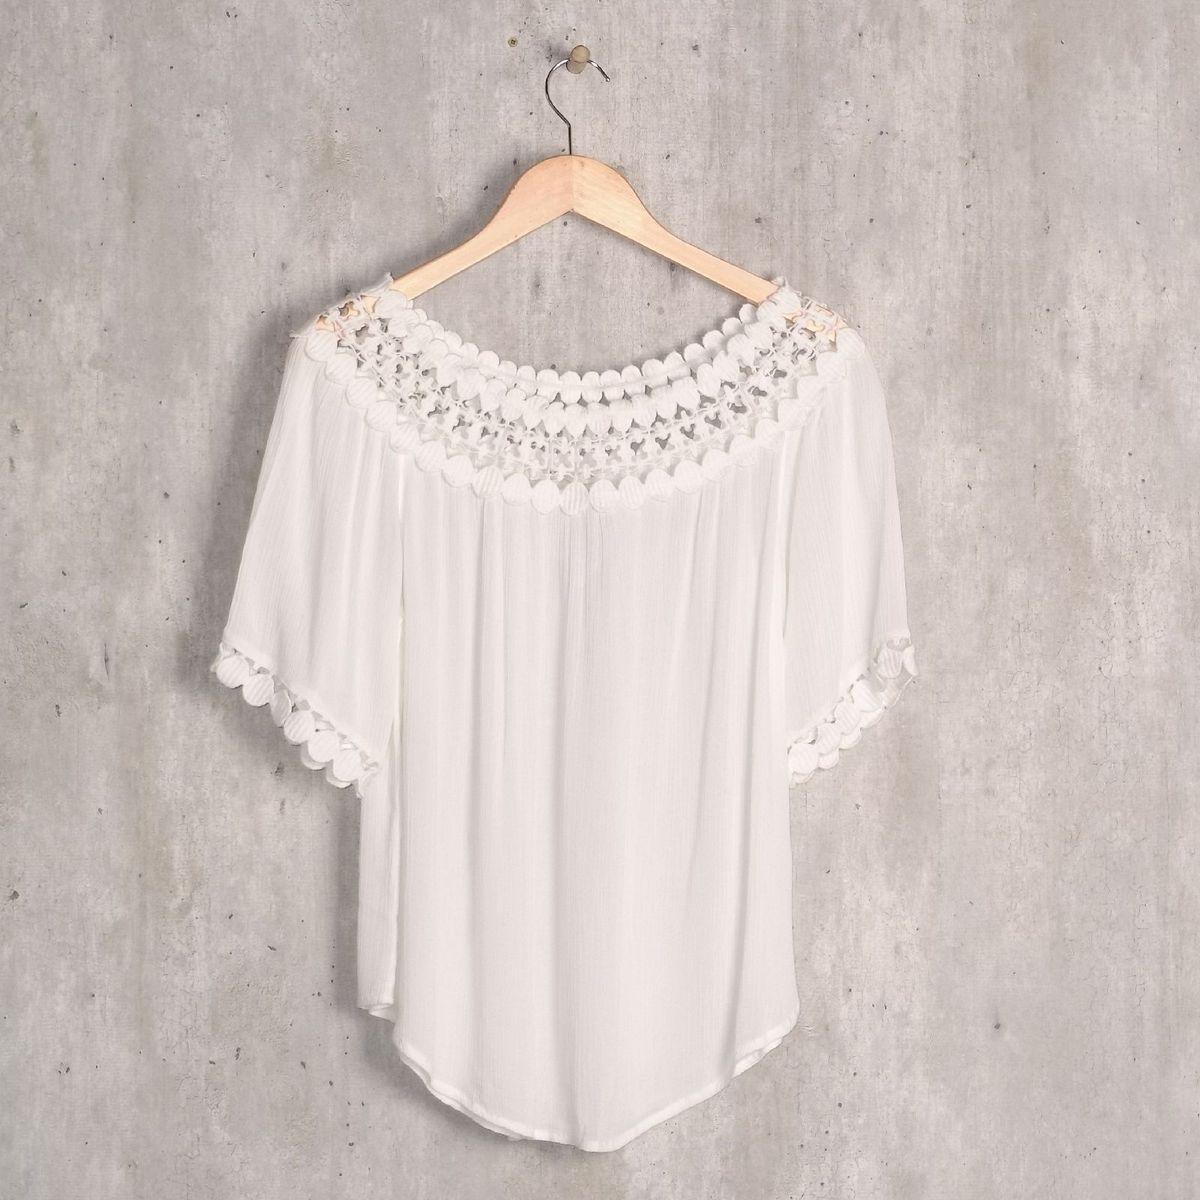 blusa branca yessica - blusas yessica